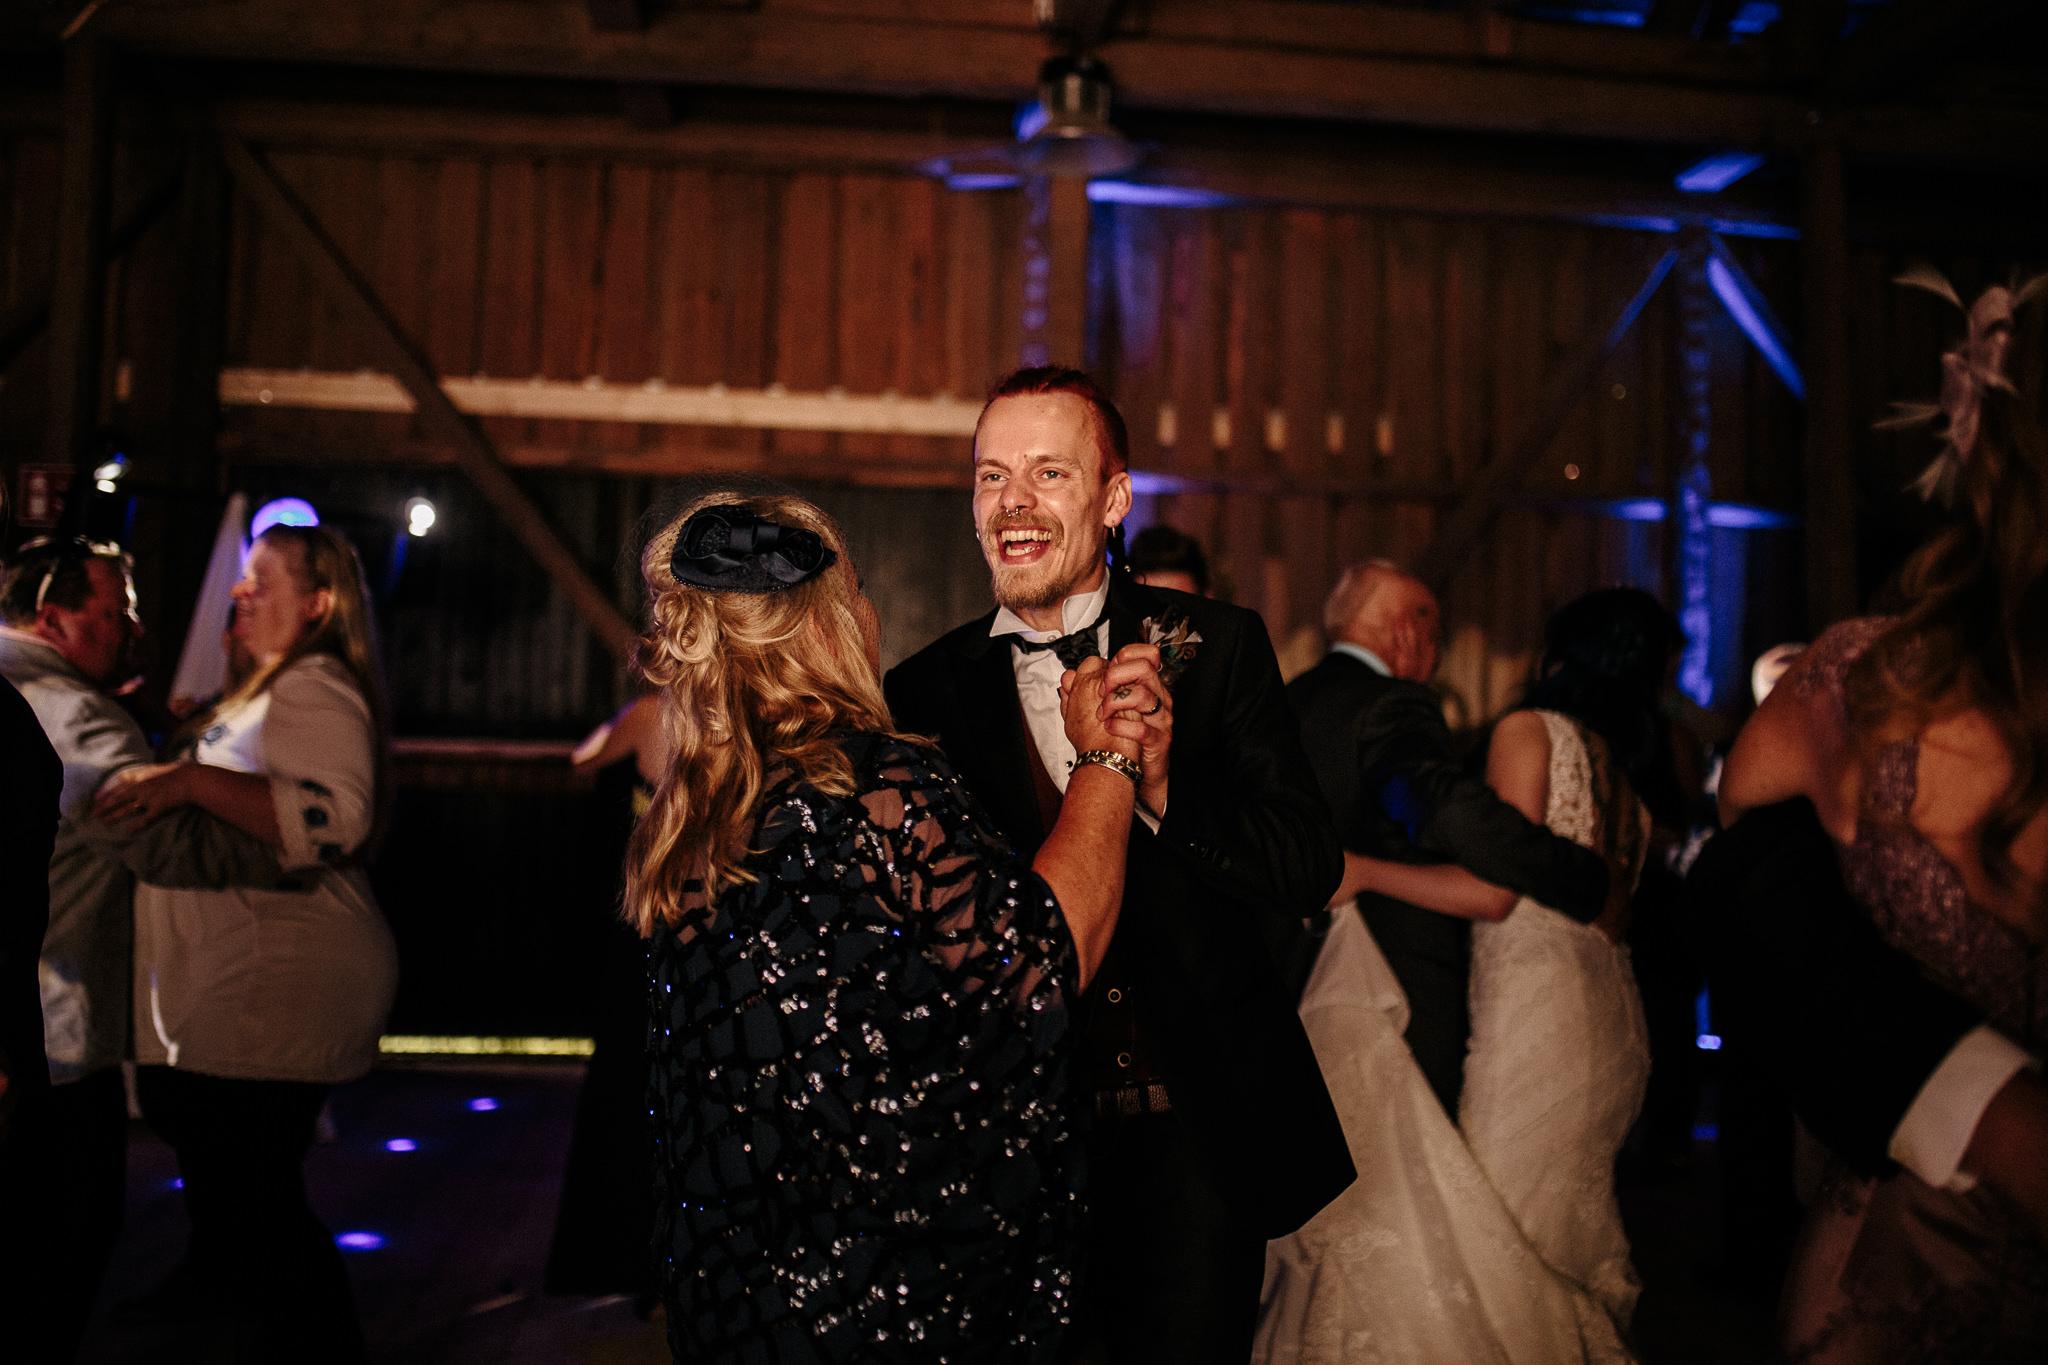 Ceren & Jani - Finland Wedding Photographer - Weddings by Qay - Wedding Photographer (145 of 166).jpg